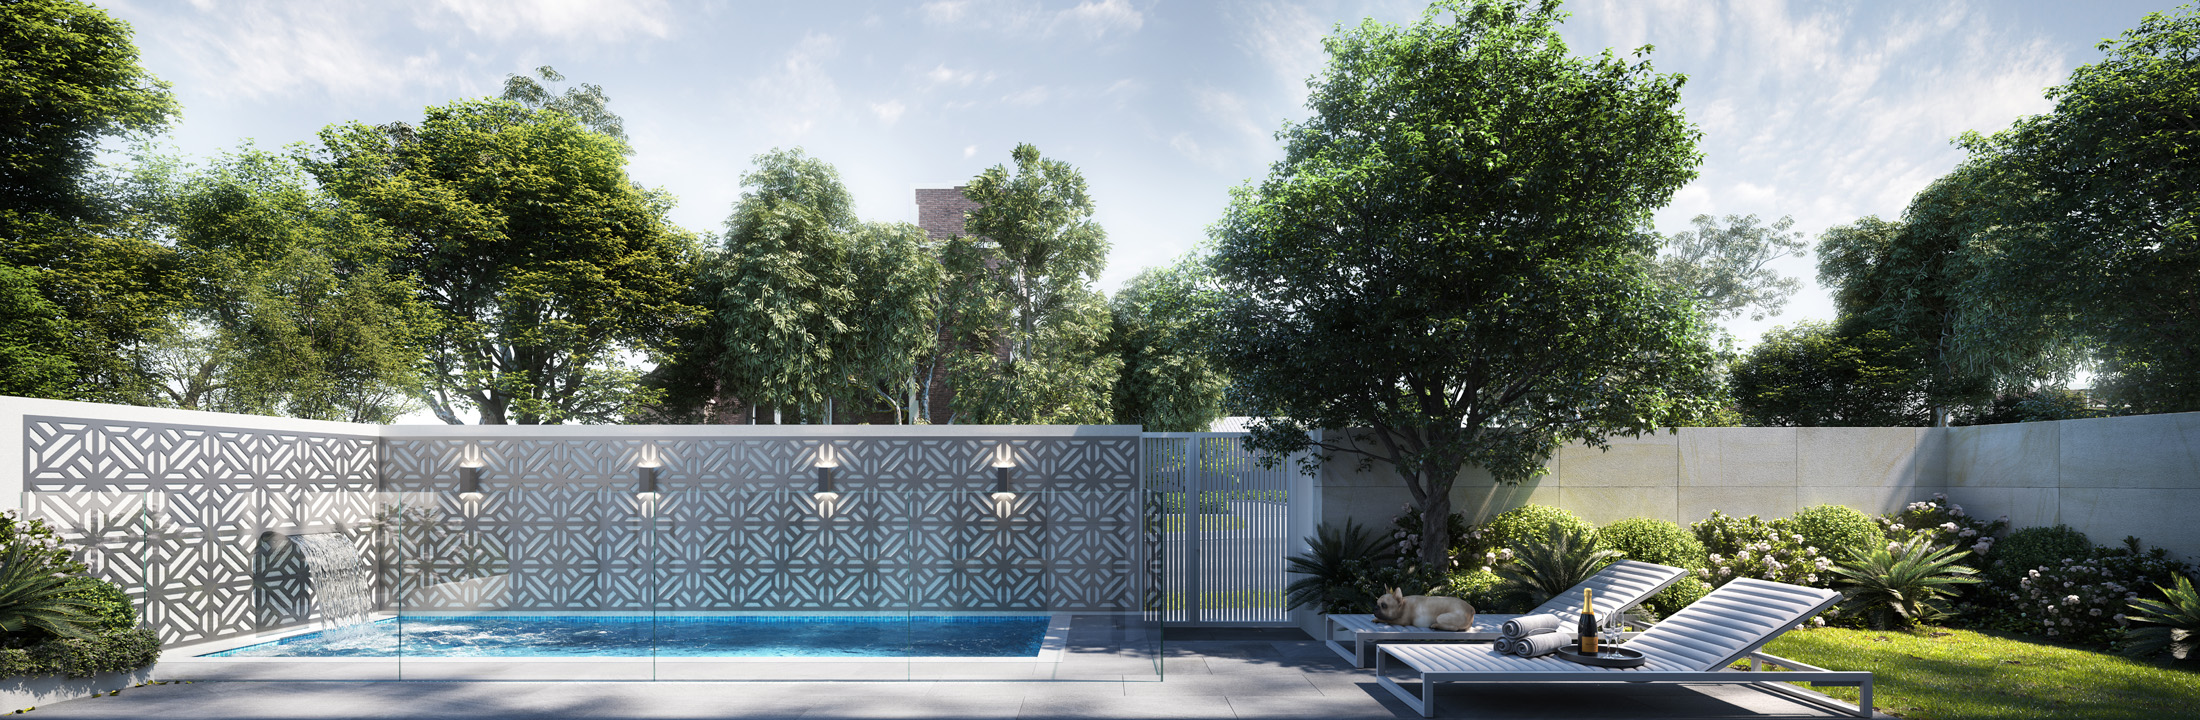 Trentham-House-pool-sandringham-Melbourne-3d-image-visualisation